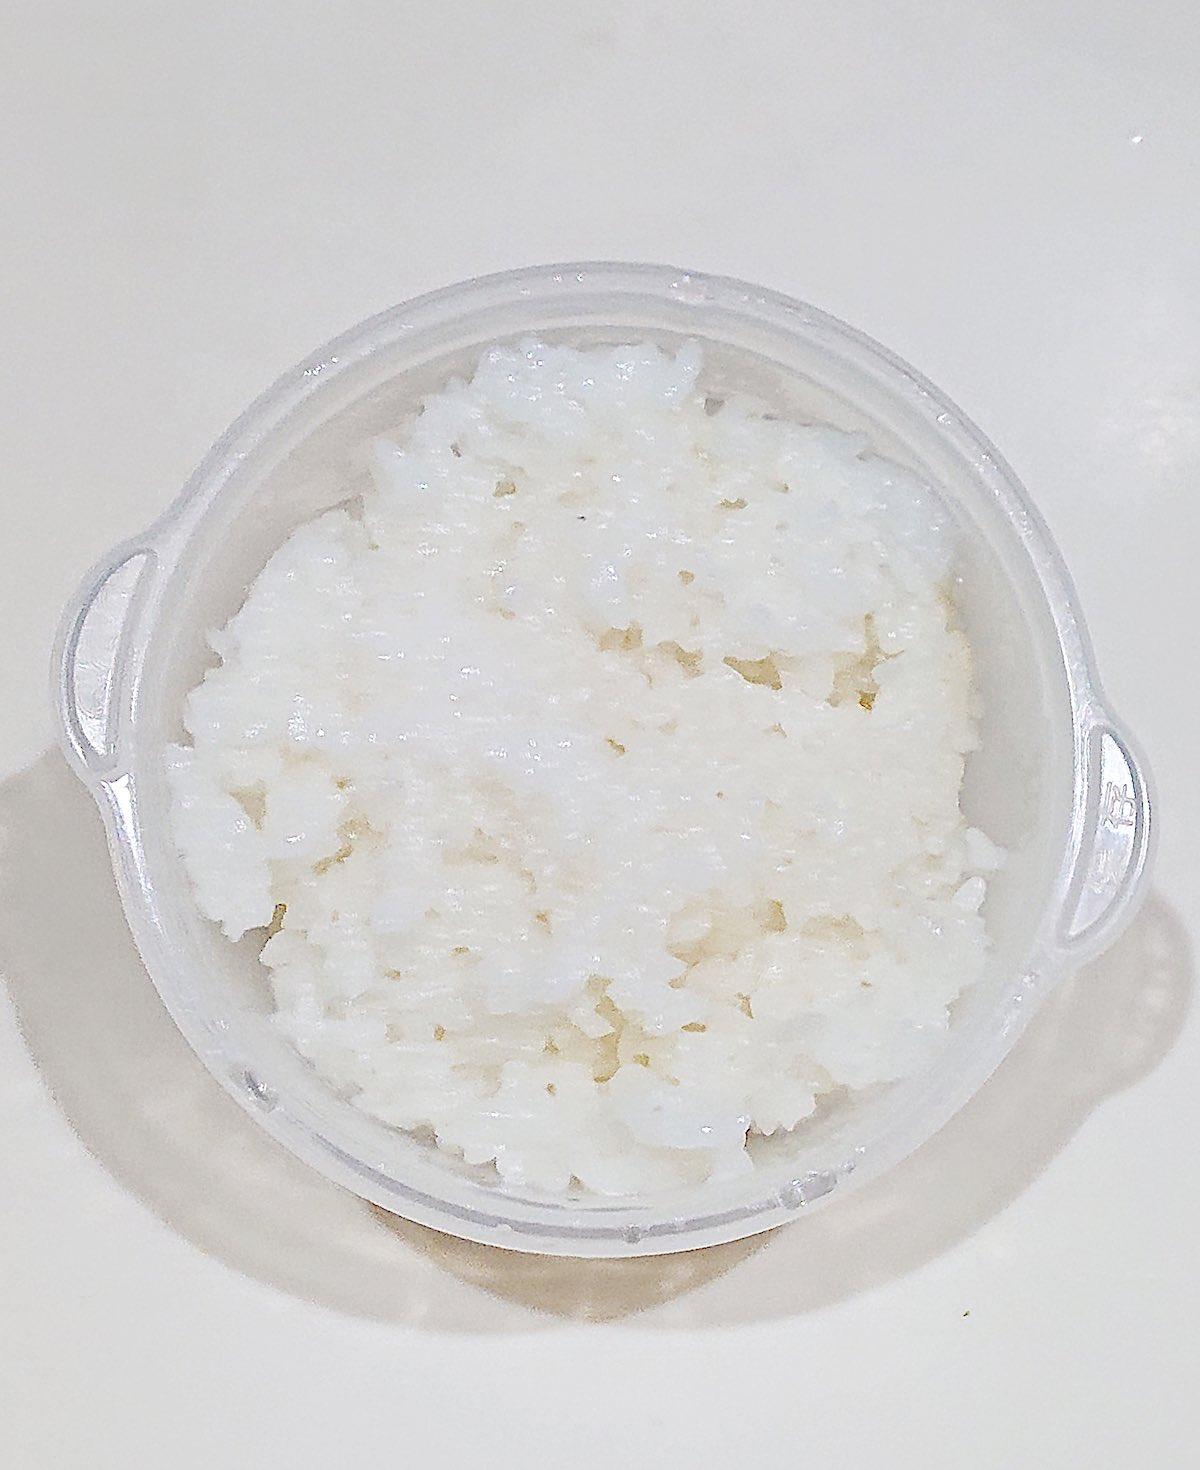 AINX 糖質カット炊飯器